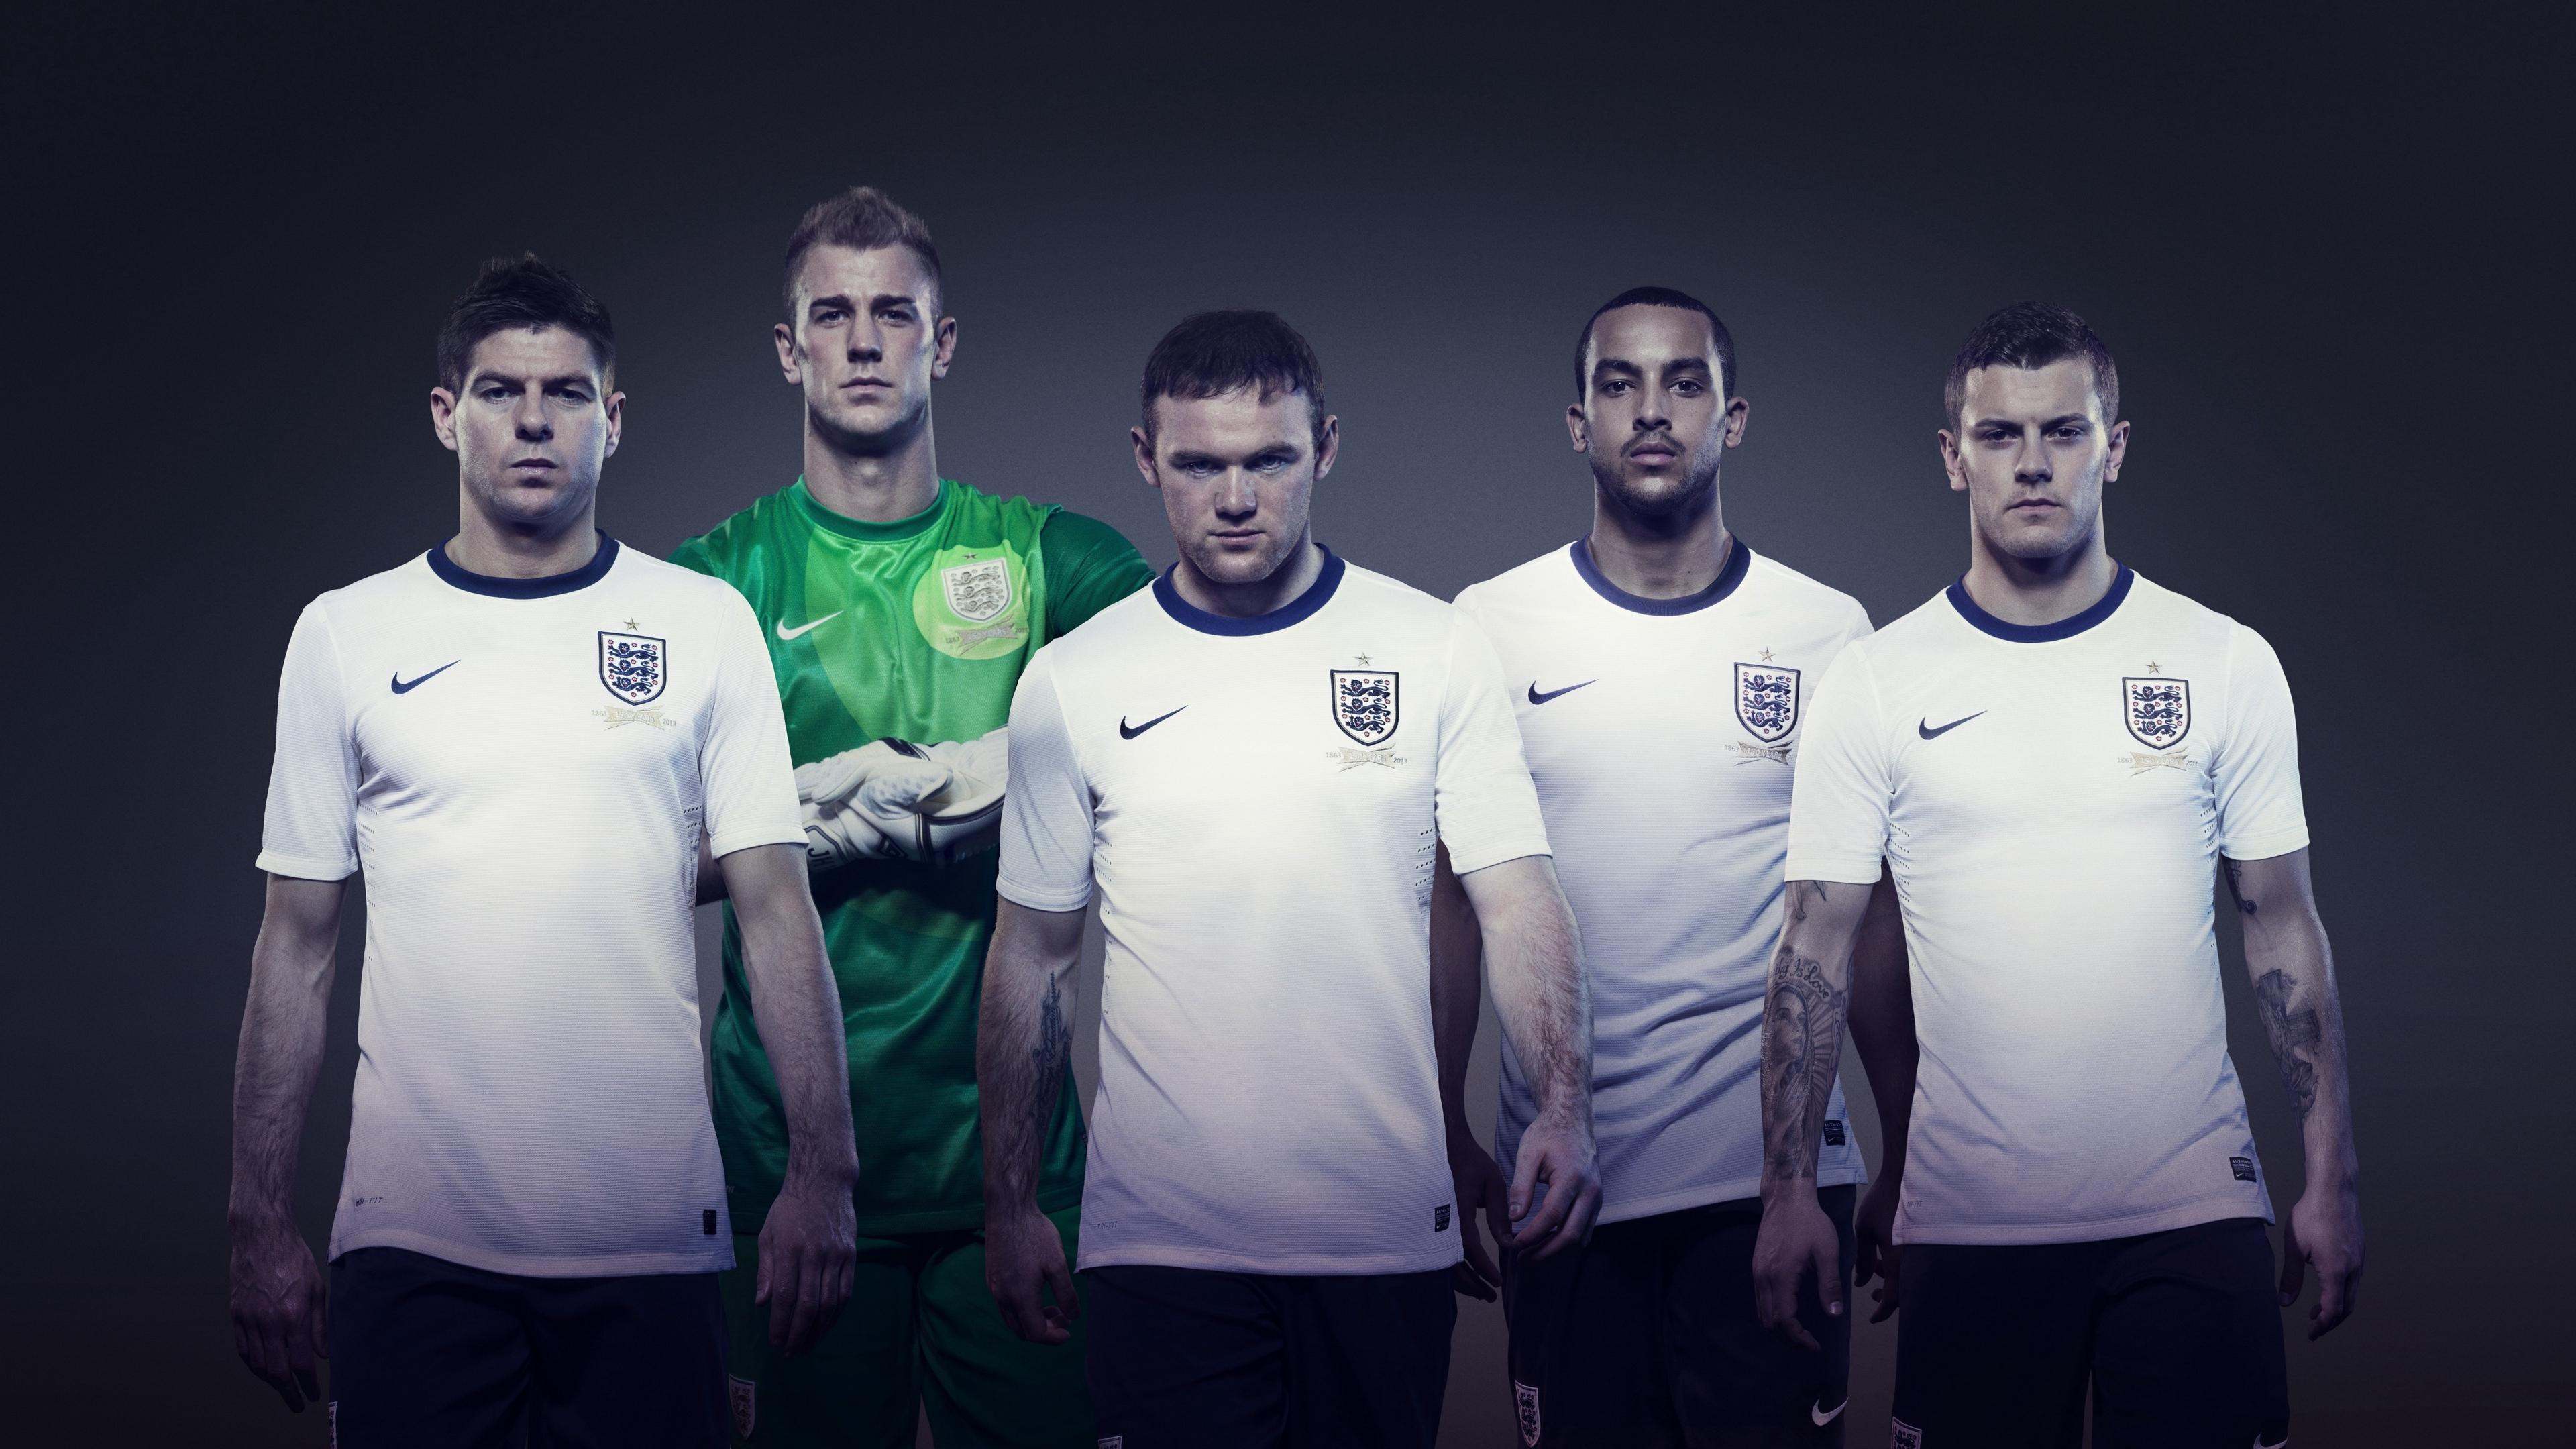 football jack wilshere wayne rooney joe hart steven gerrard theo walcott england shape nike team england 4k 1540063424 - football, jack wilshere, wayne rooney, joe hart, steven gerrard, theo walcott, england, shape, nike, team england 4k - wayne rooney, jack wilshere, Football